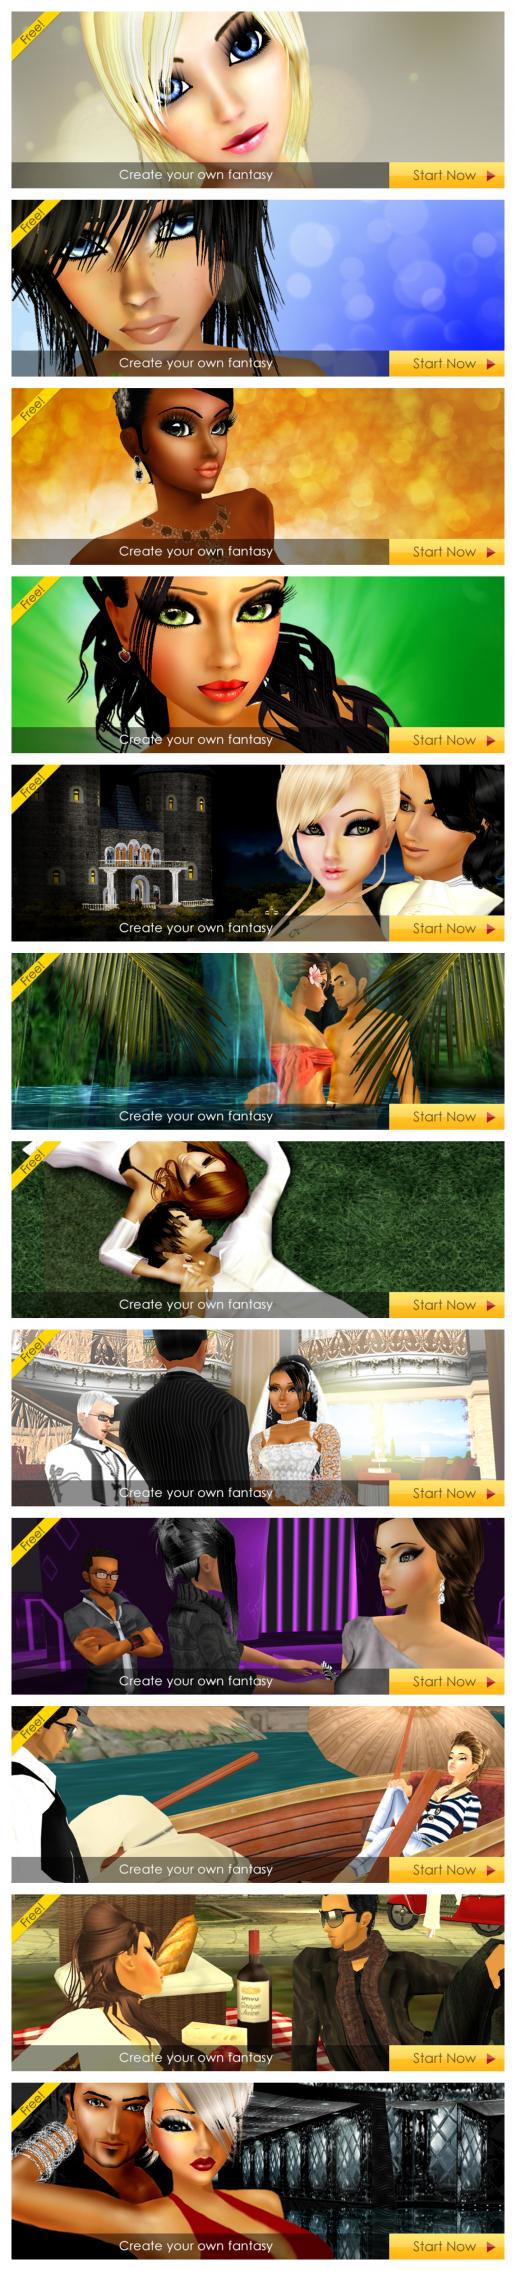 imvu-home-page-main-image-mockup-previews